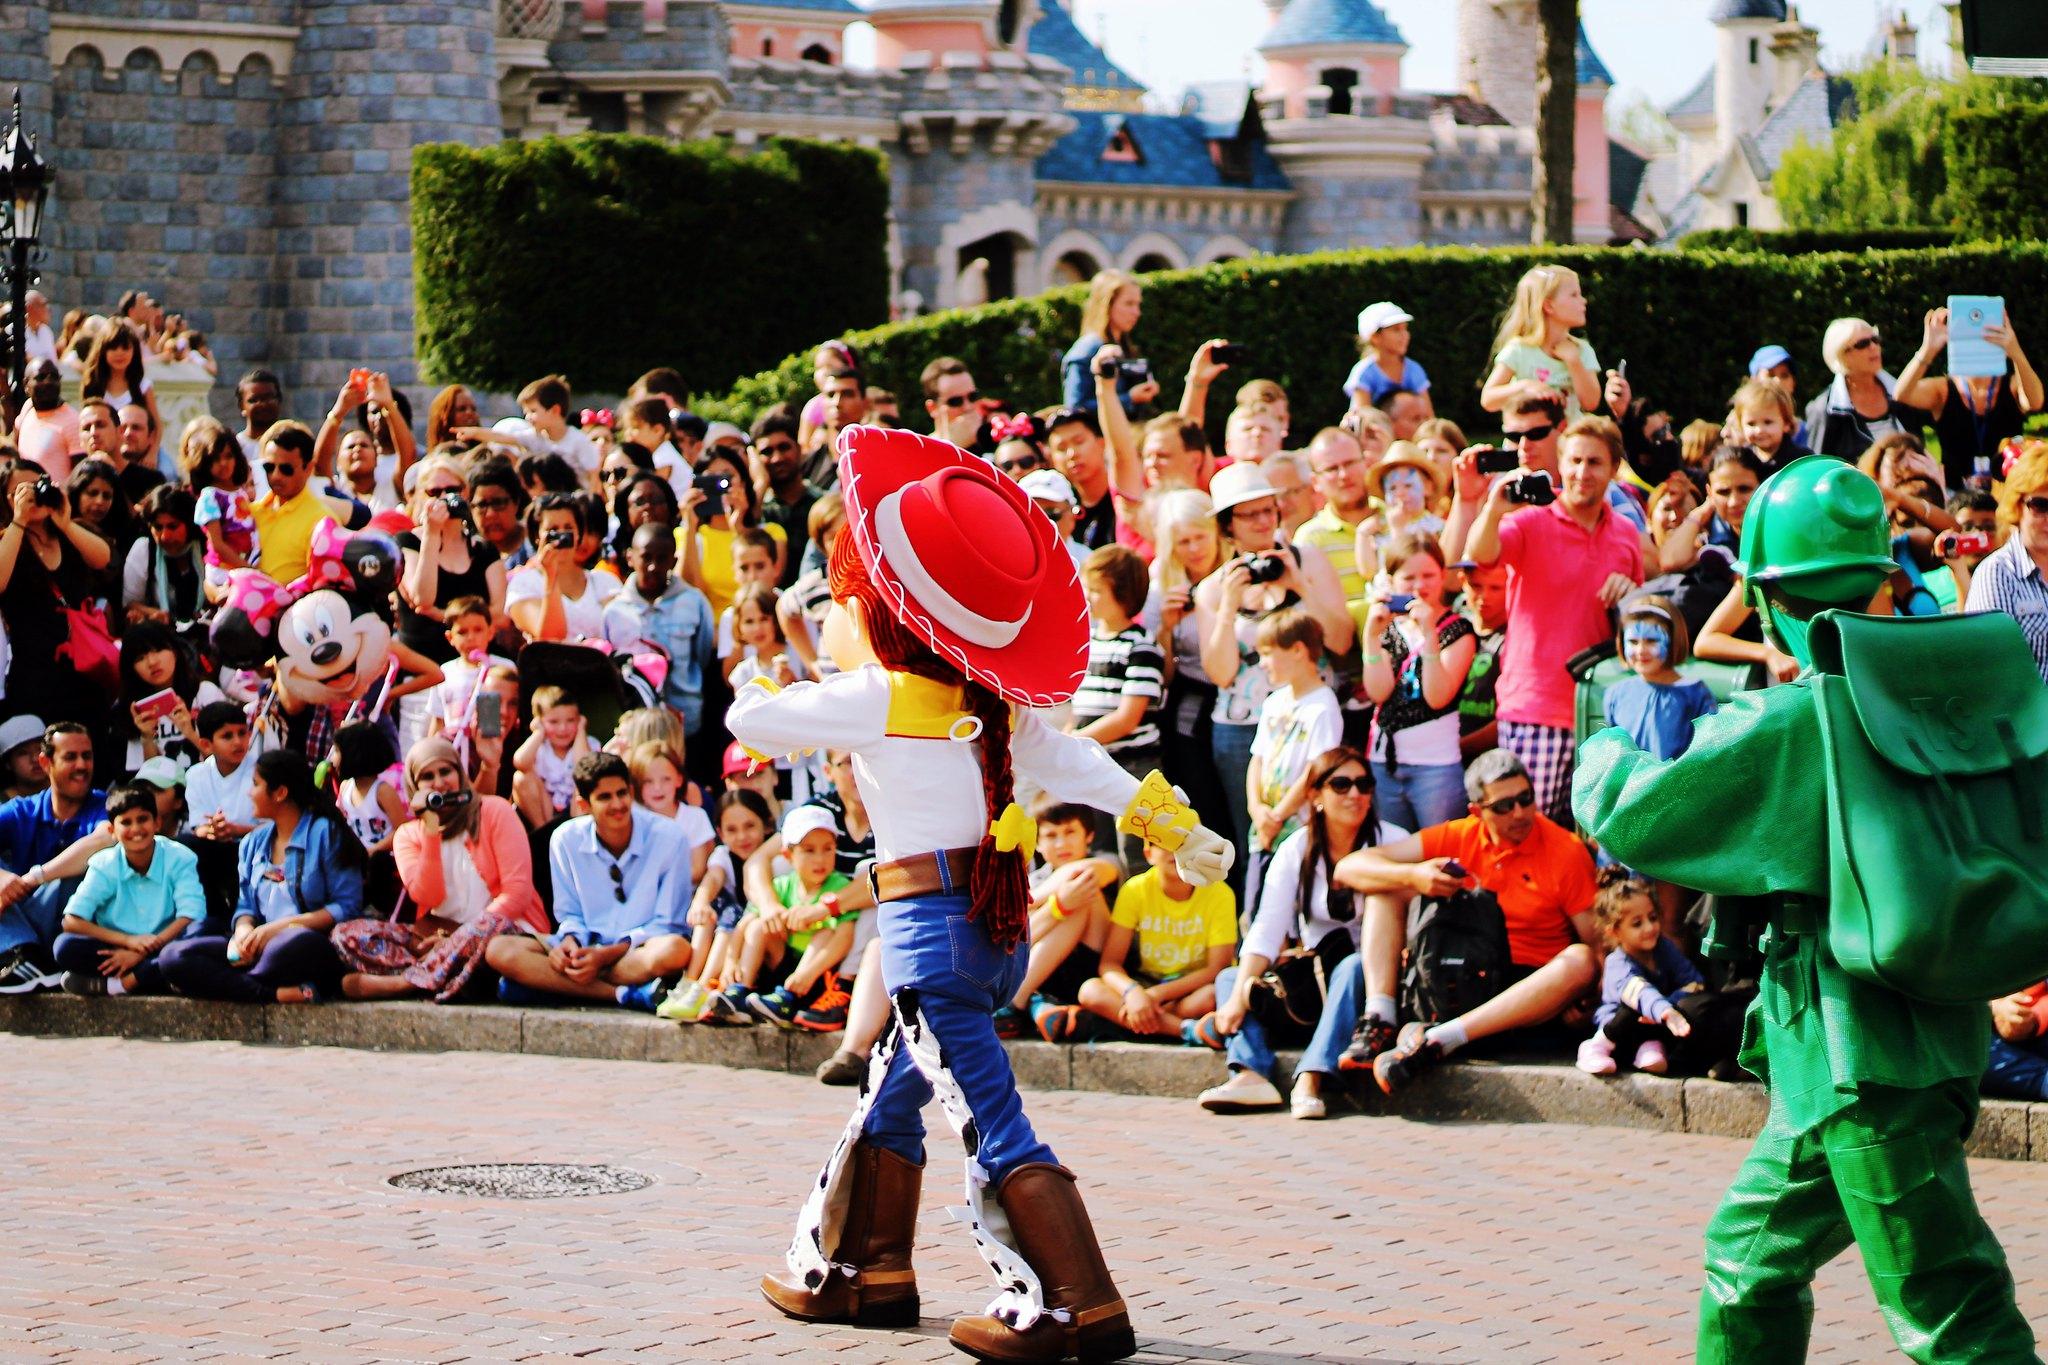 25º aniversário Disneyland Paris - Drawing Dreaming